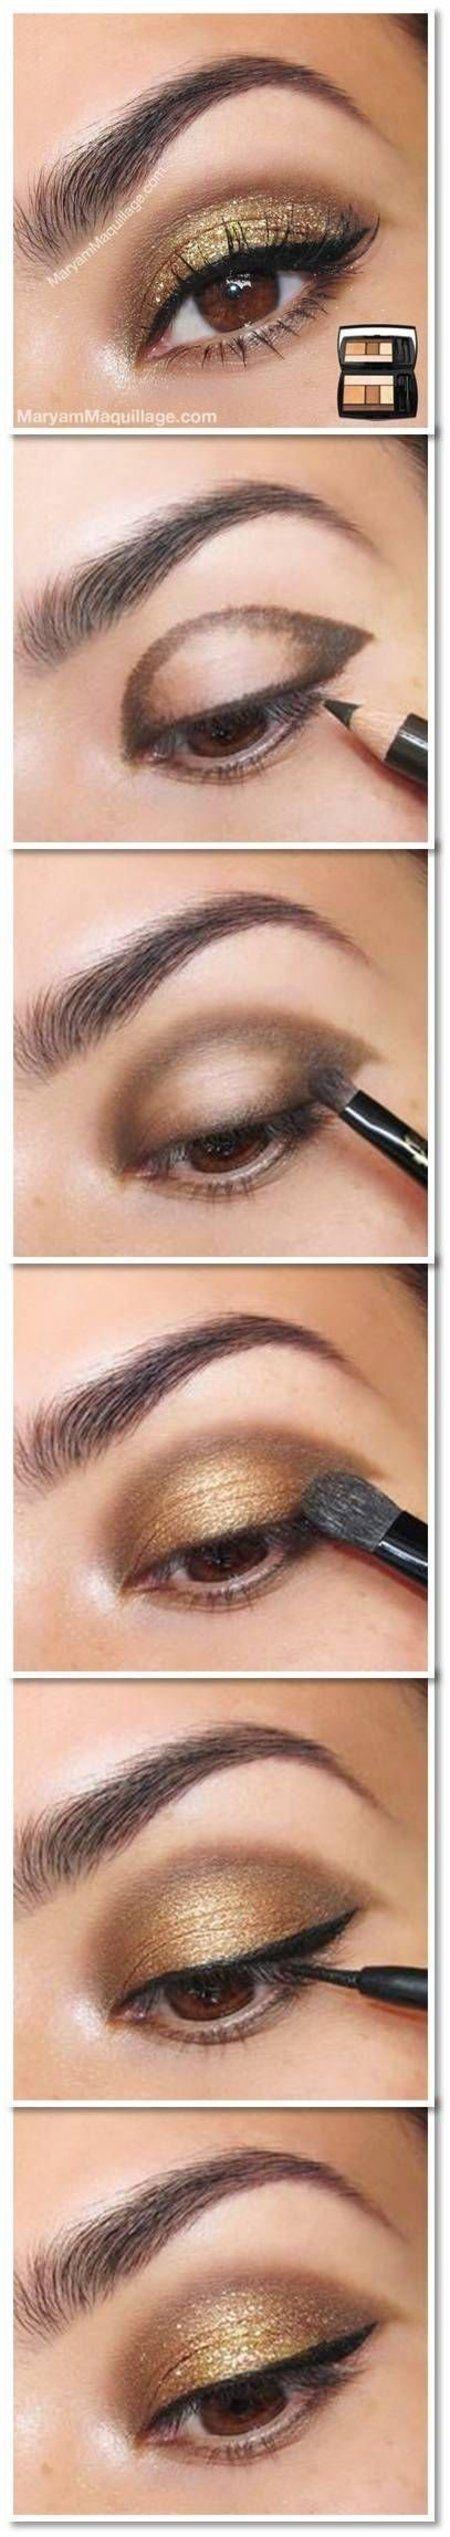 HOW TO: Gold glitter eye look Mary Kay mineral eye color Amber Blaze, Sienna or Cinnabar black liquid eyeliner by mickichele